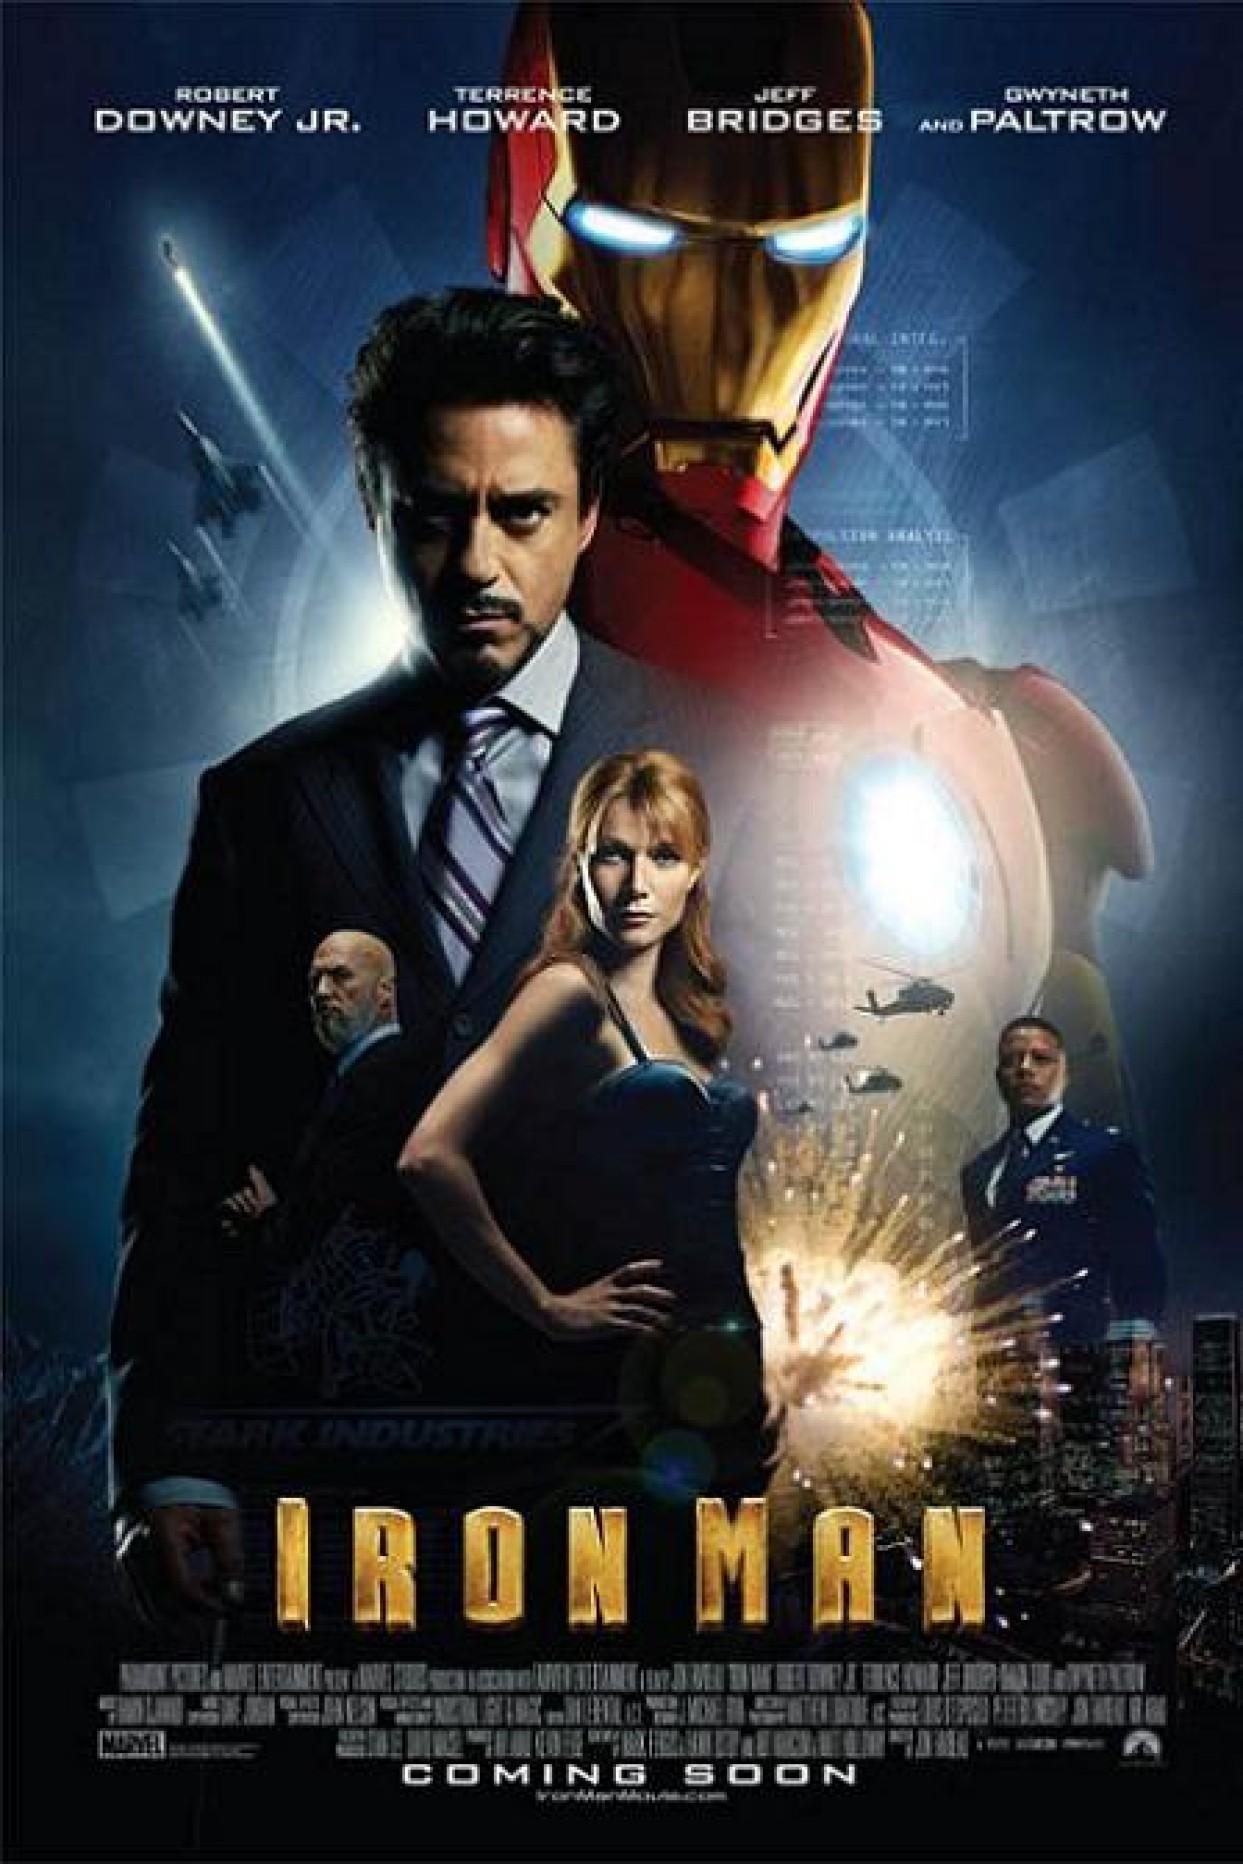 Iron-Man-2008-Film